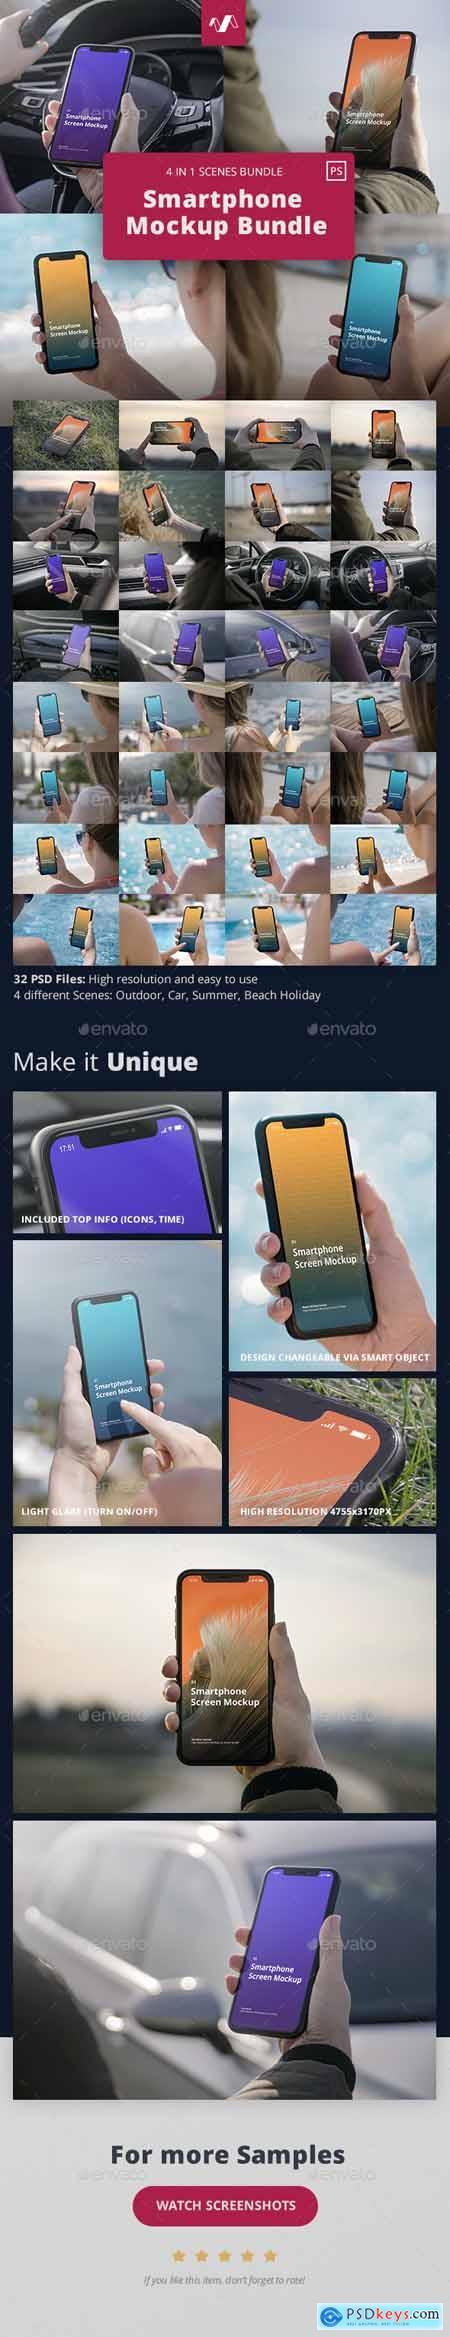 Phone Mockup Scenes Bundle 29808457